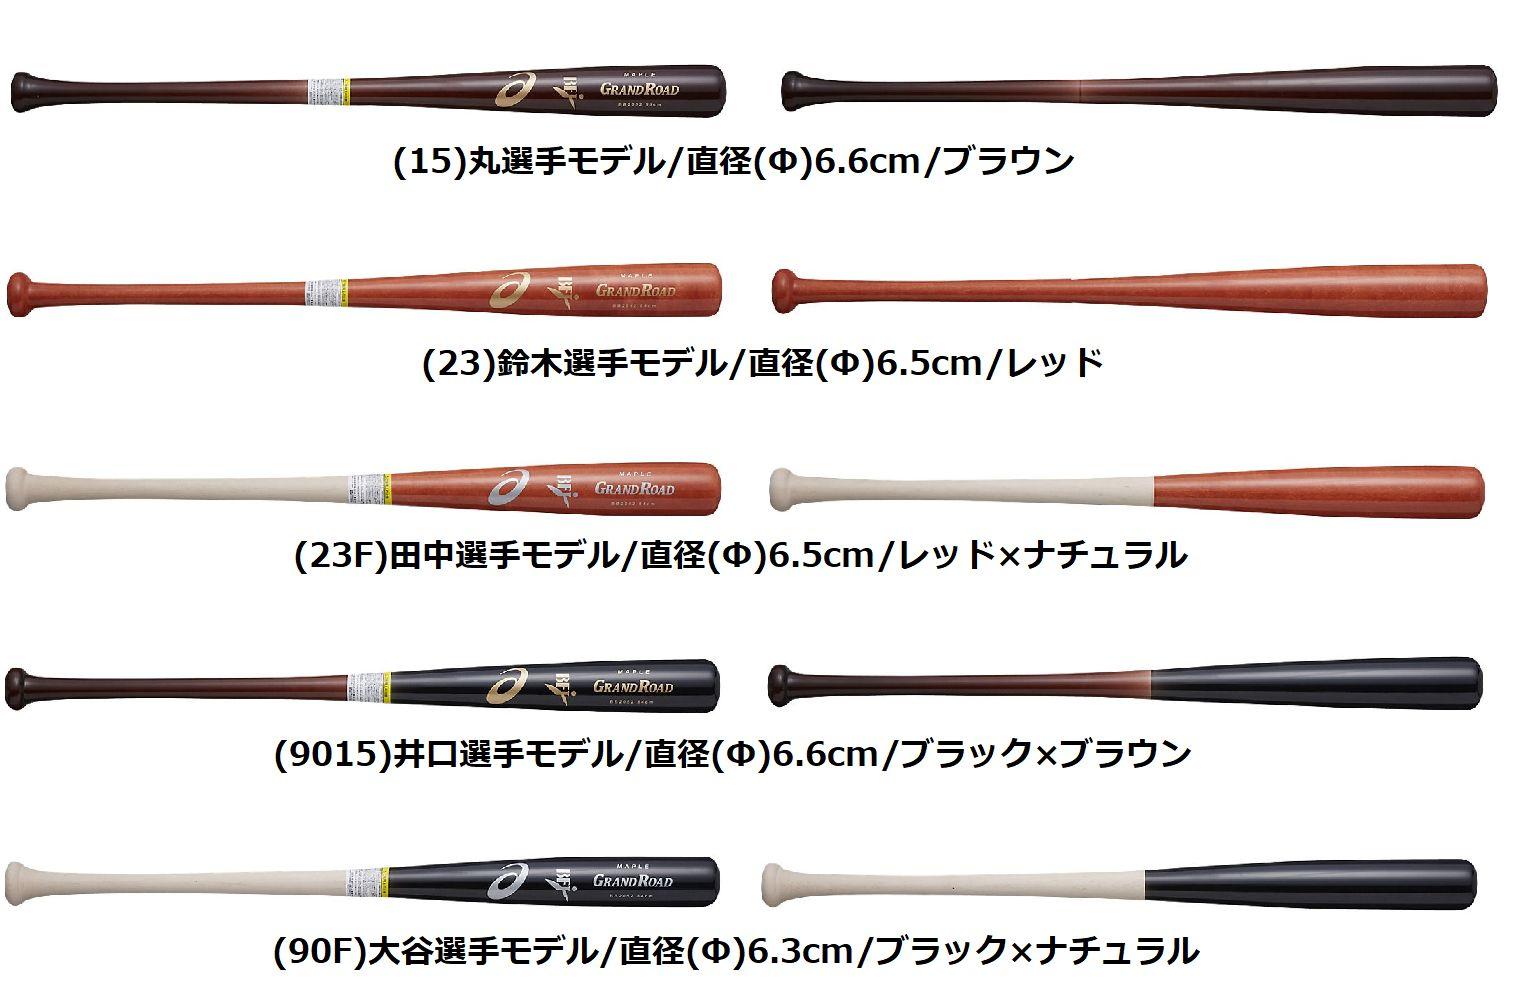 【Asics=アシックス】野球硬式用木製バット(メイプル)<GRAND ROAD グランドロード/BFJマーク付き>[<S84>84cm(900g平均)][<S85>85cm(900g平均)]<直径:平均φ63mm-66mm>(5色展開)